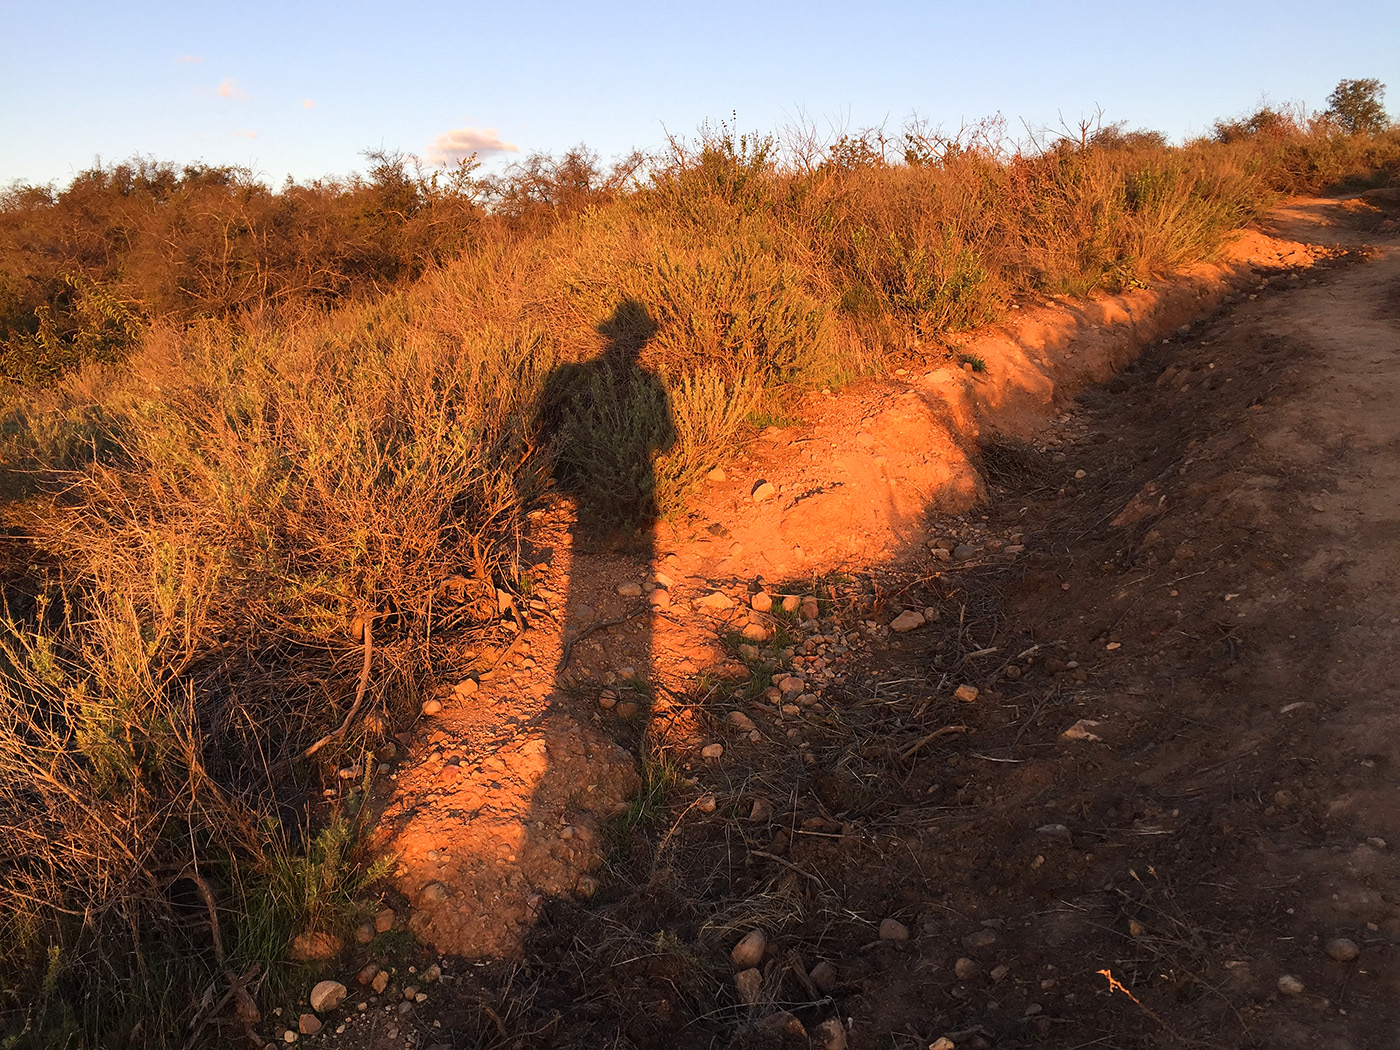 backbone-trail-trailnamebackstroke-3516.jpg